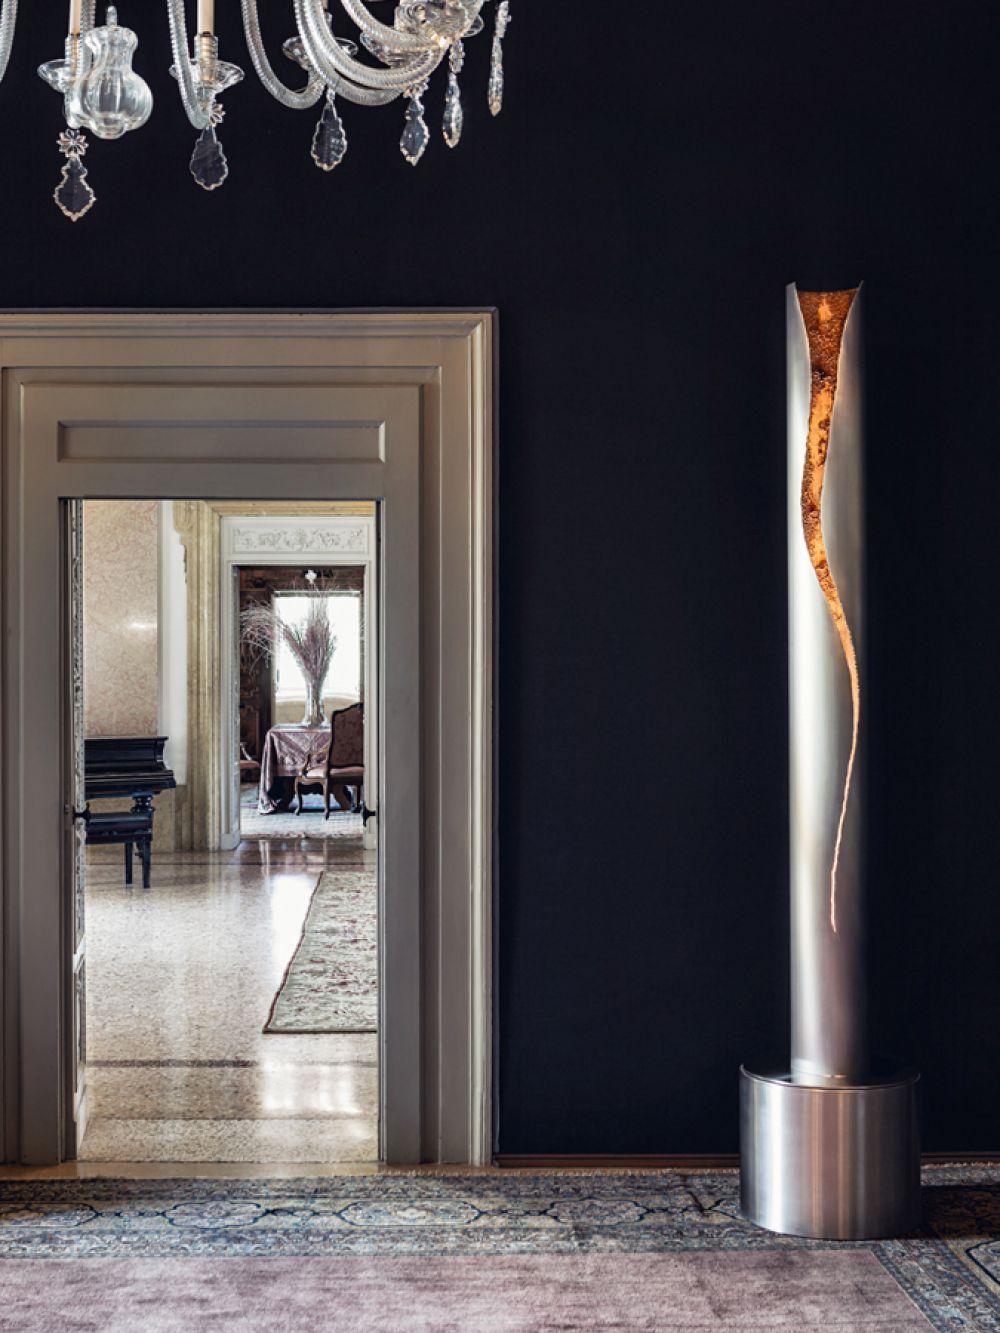 CUT I Stainless steel Sculptural lighting